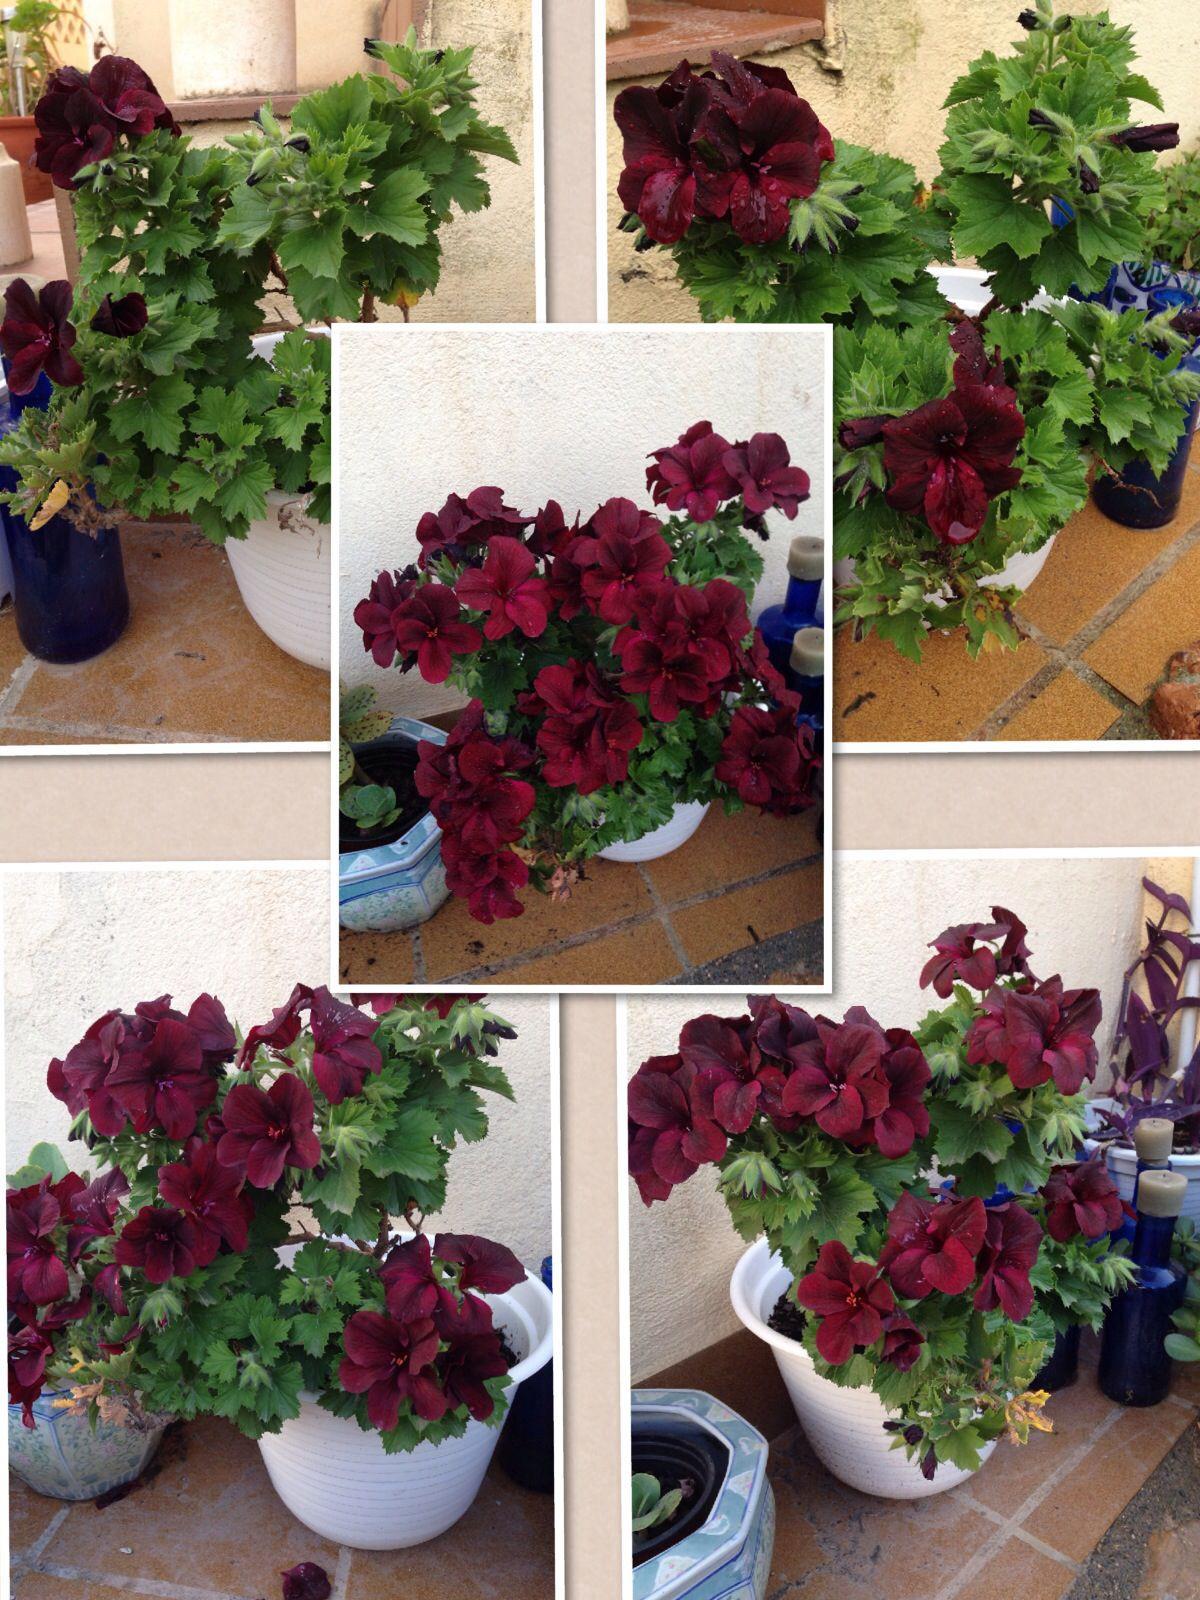 "Proceso de floraci³n de mi pelargonium ""Dark Secret"" Pineadora Mara D Balsalobre"